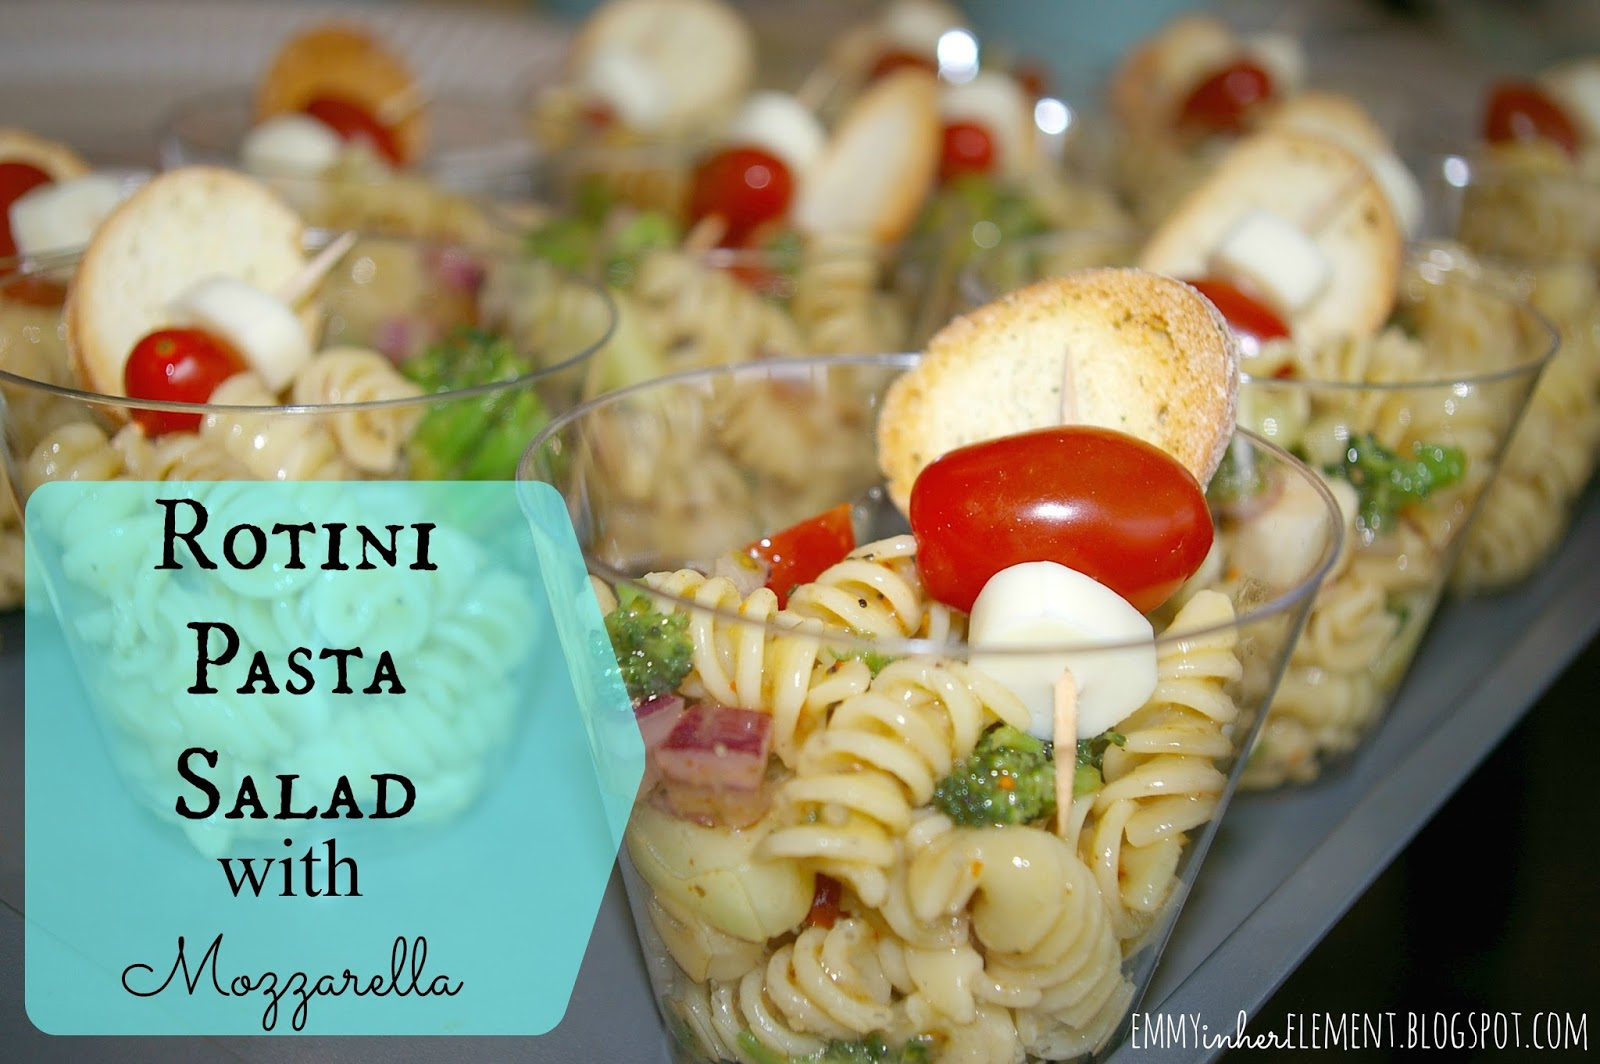 Family favorite pasta recipes